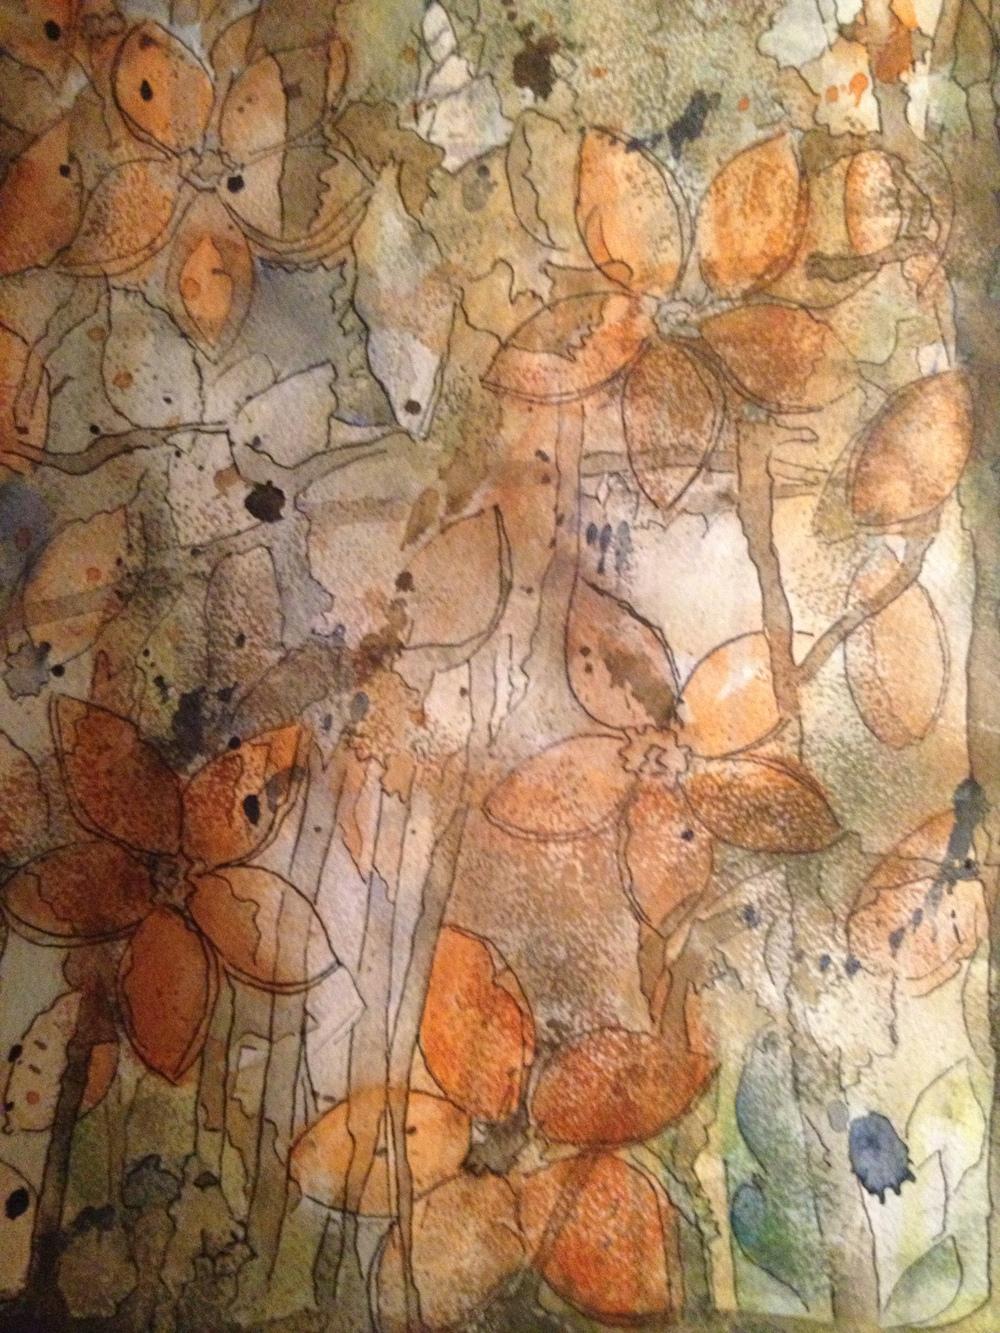 Nyanser    Akvarell   Mått 40x70      Kontakta mig